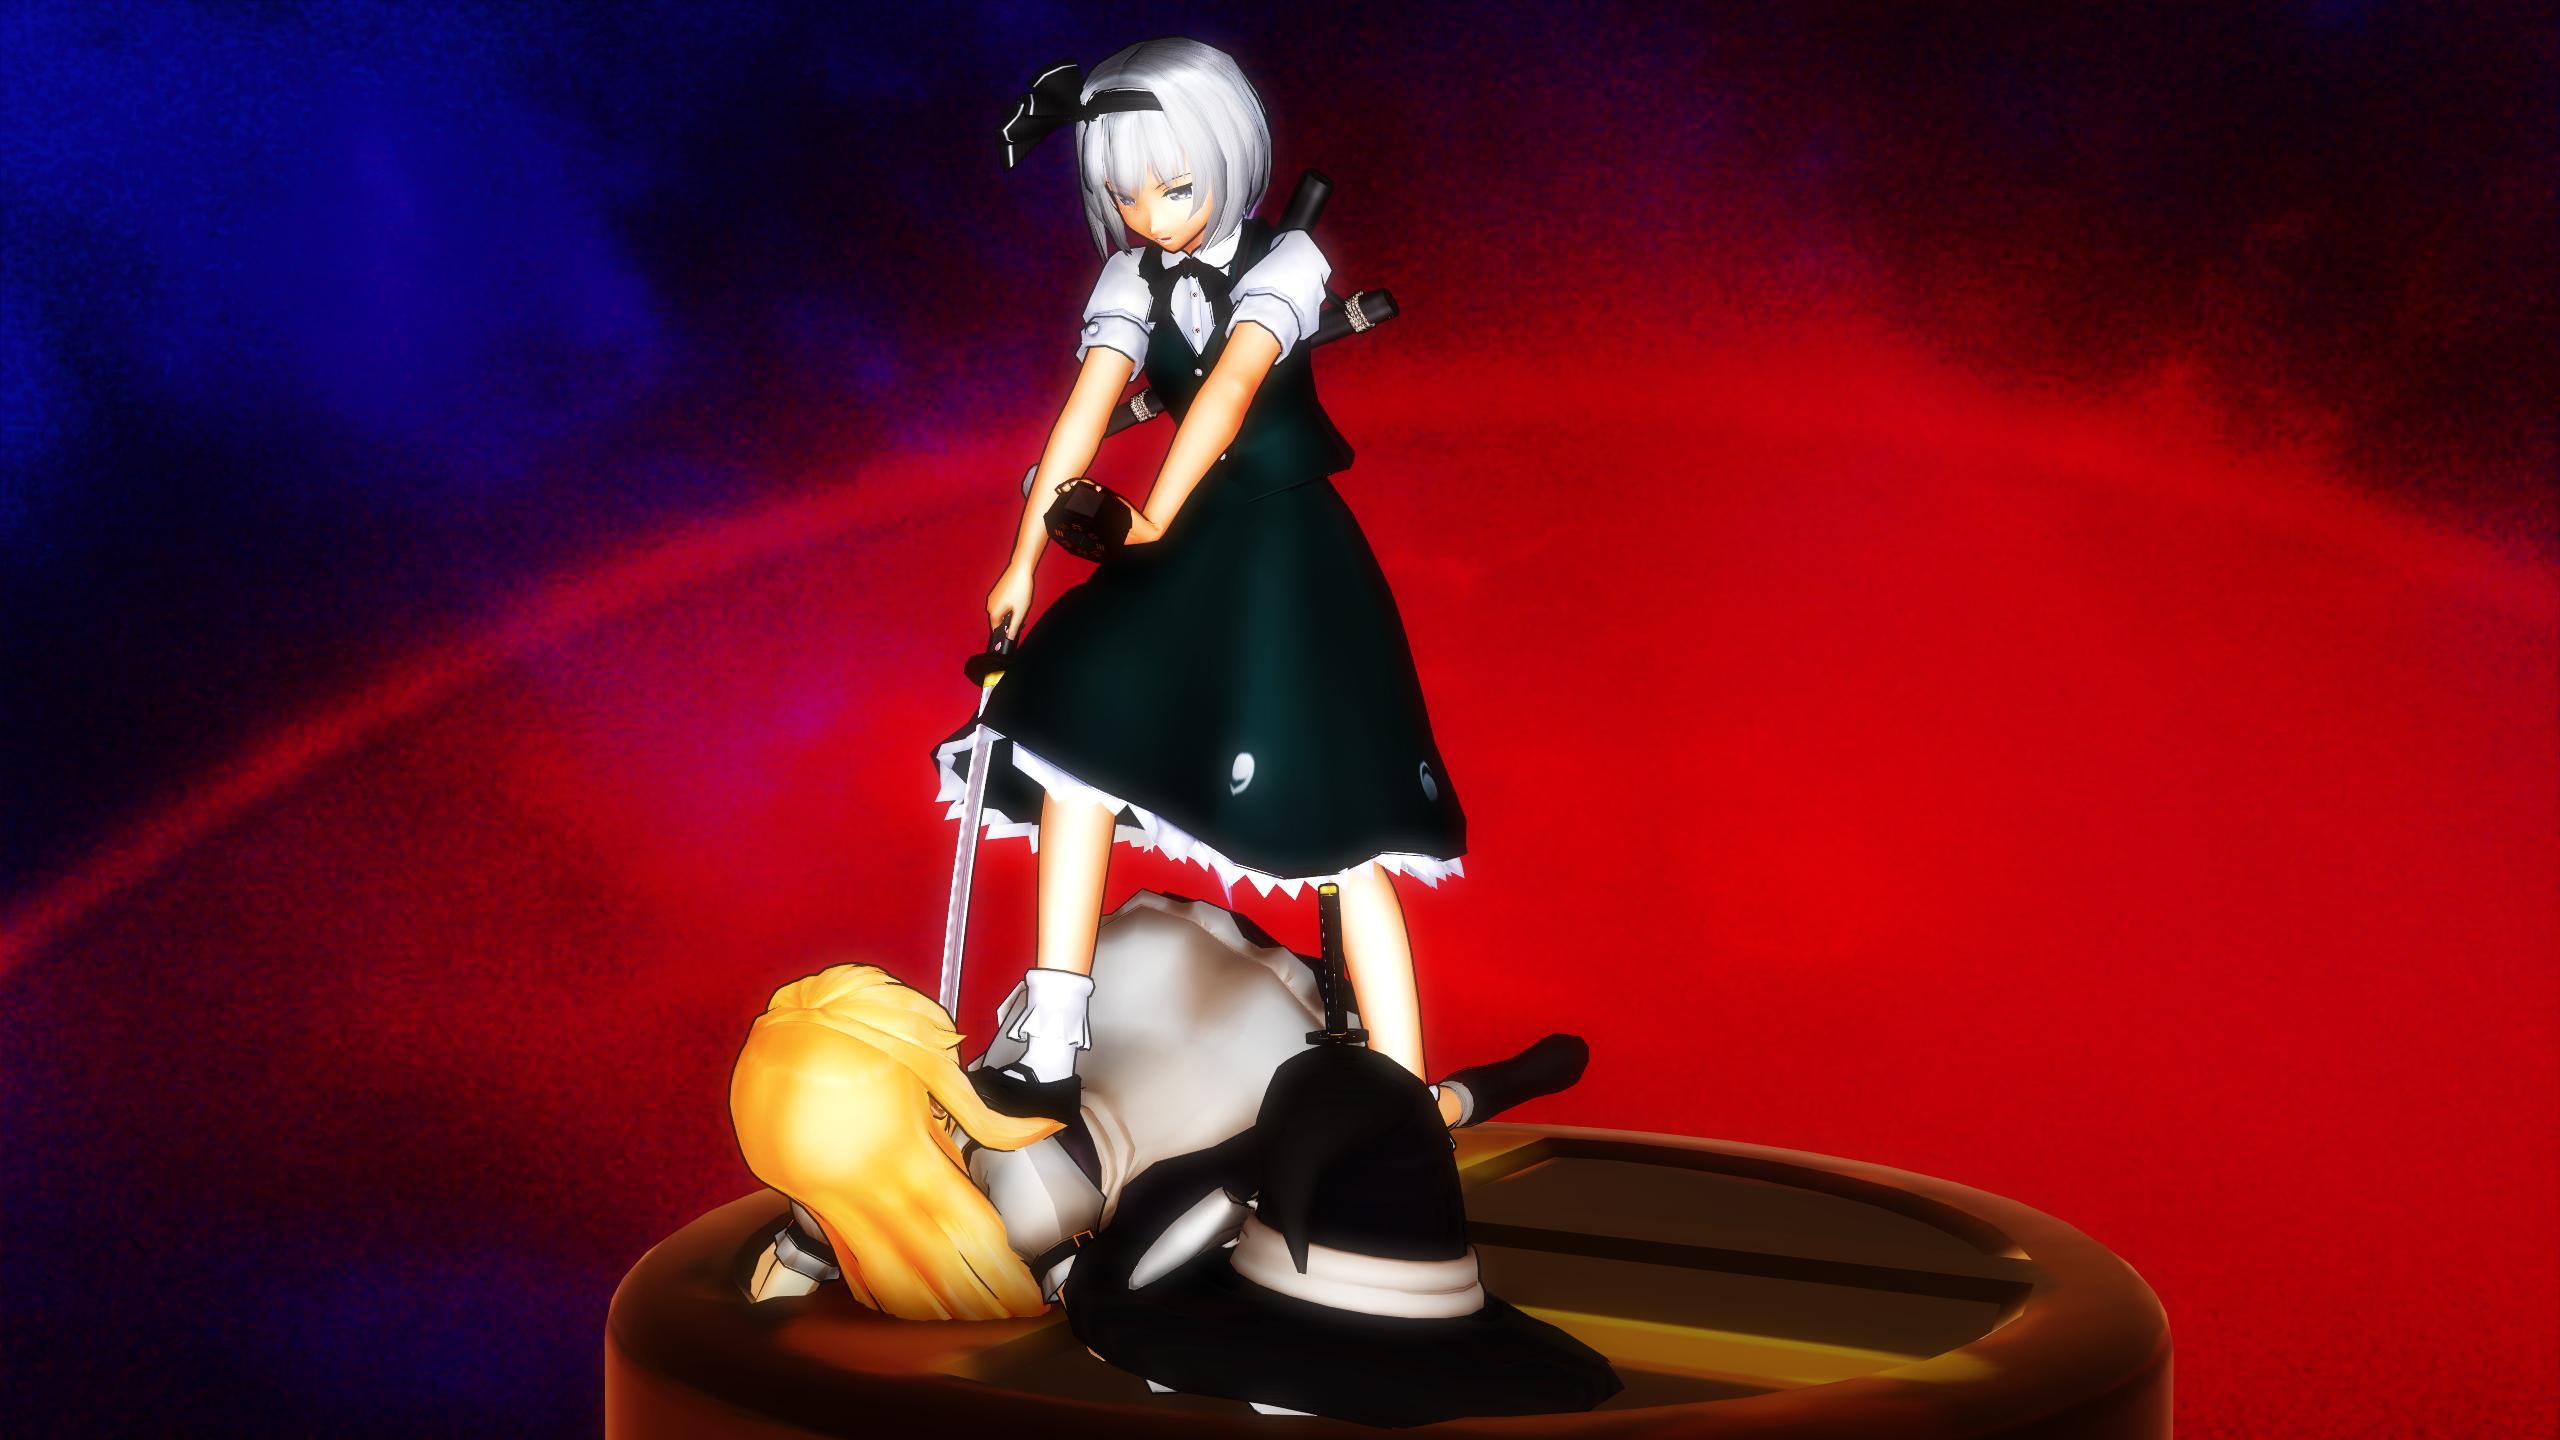 Smash Bros Trophy Youmu-Marisa 2560x1440 by headstert